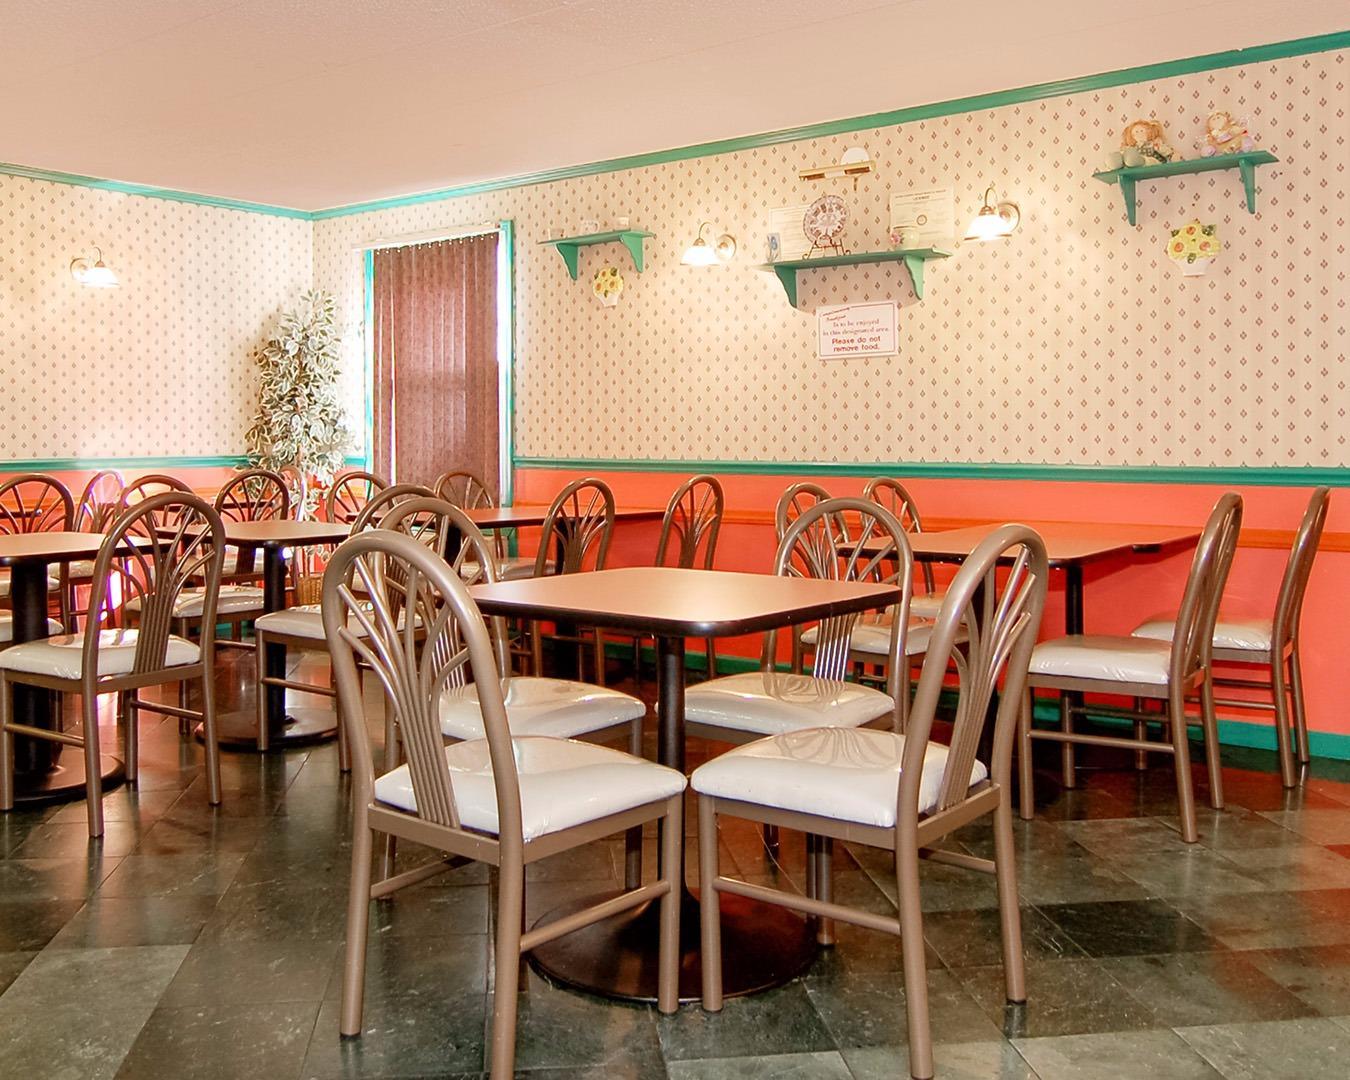 Rodeway Inn & Suites, Levittown PA